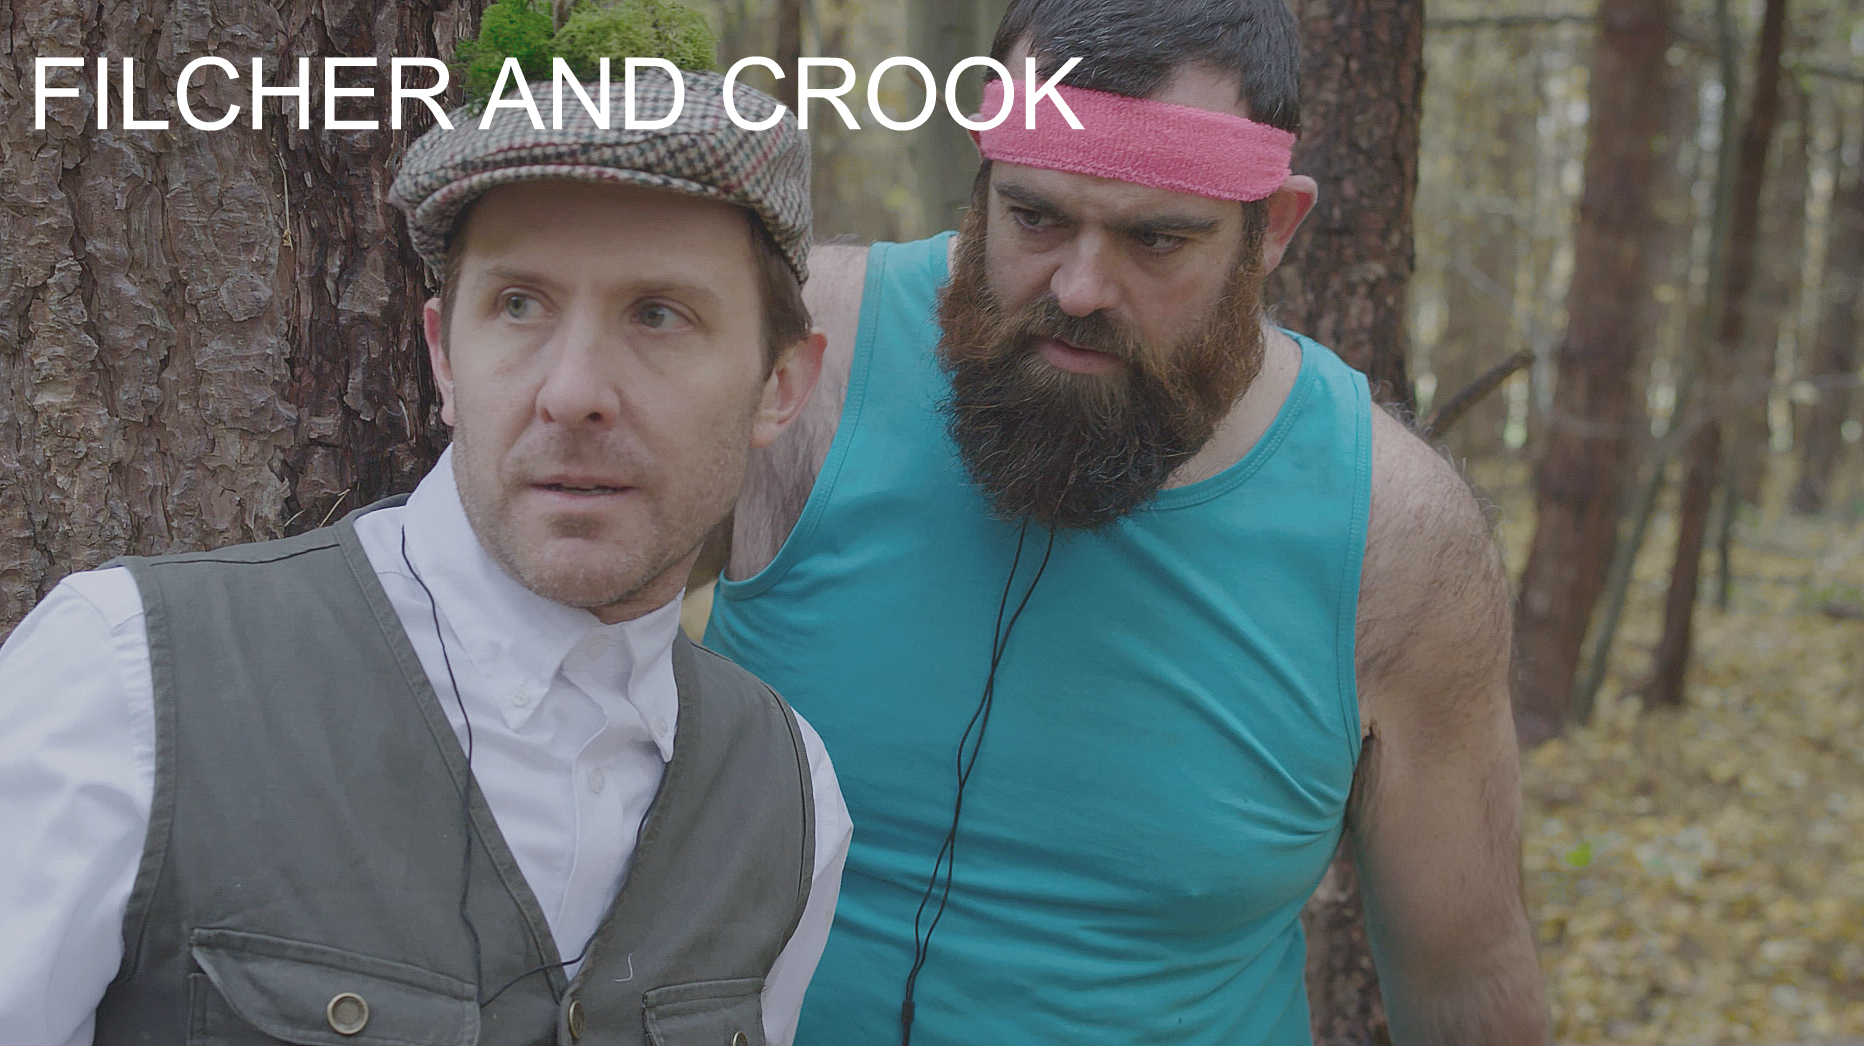 Filcher and Crook